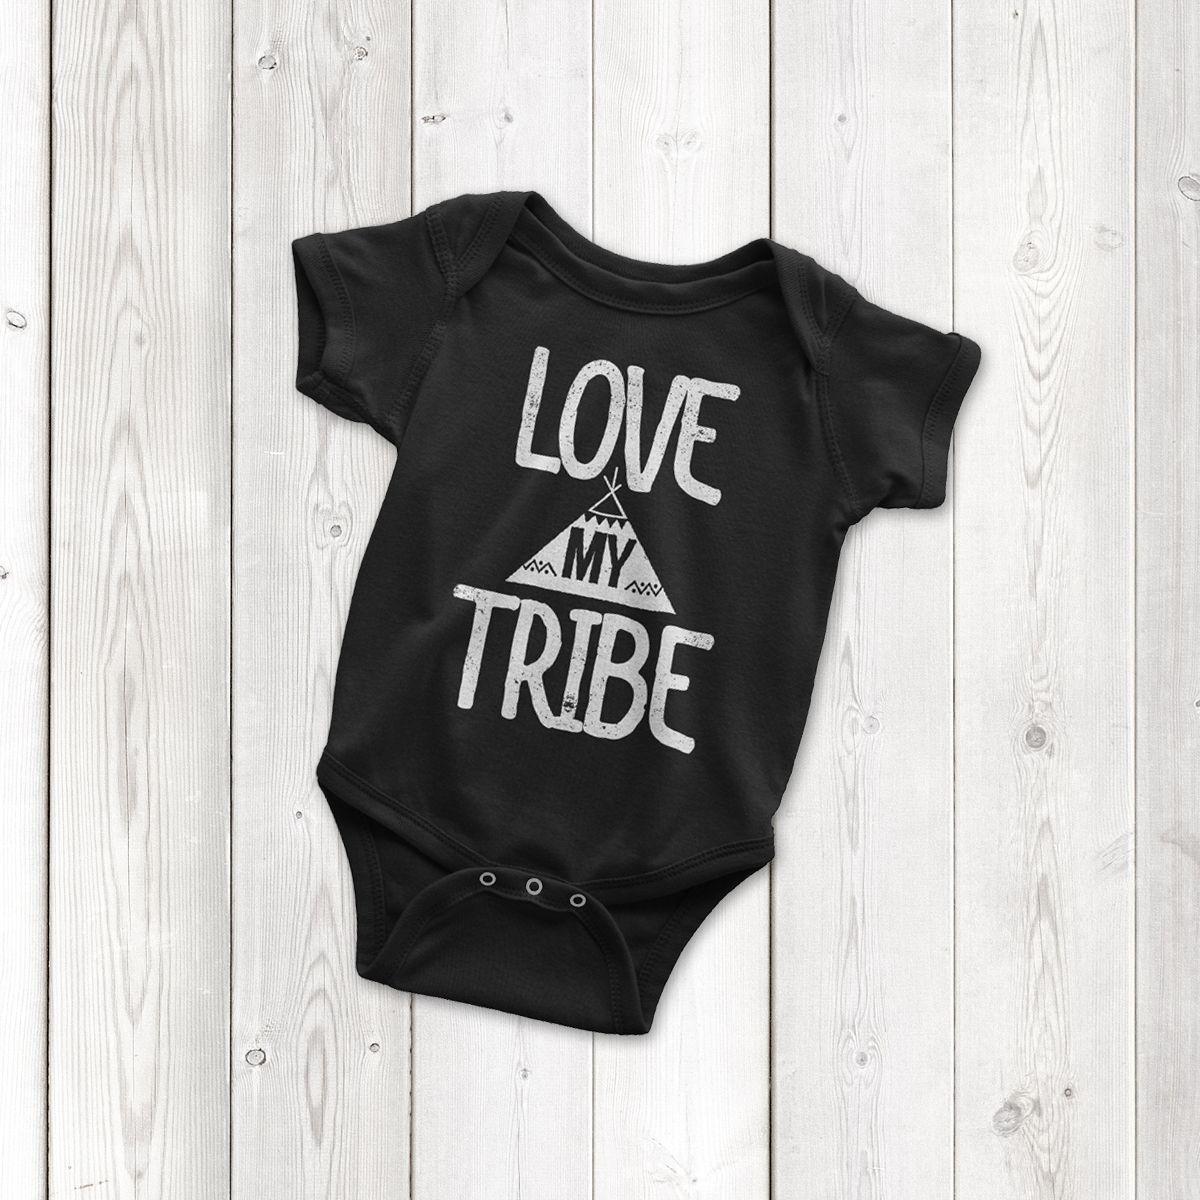 love_my_tribe.jpg Native american clothing, Baby girl